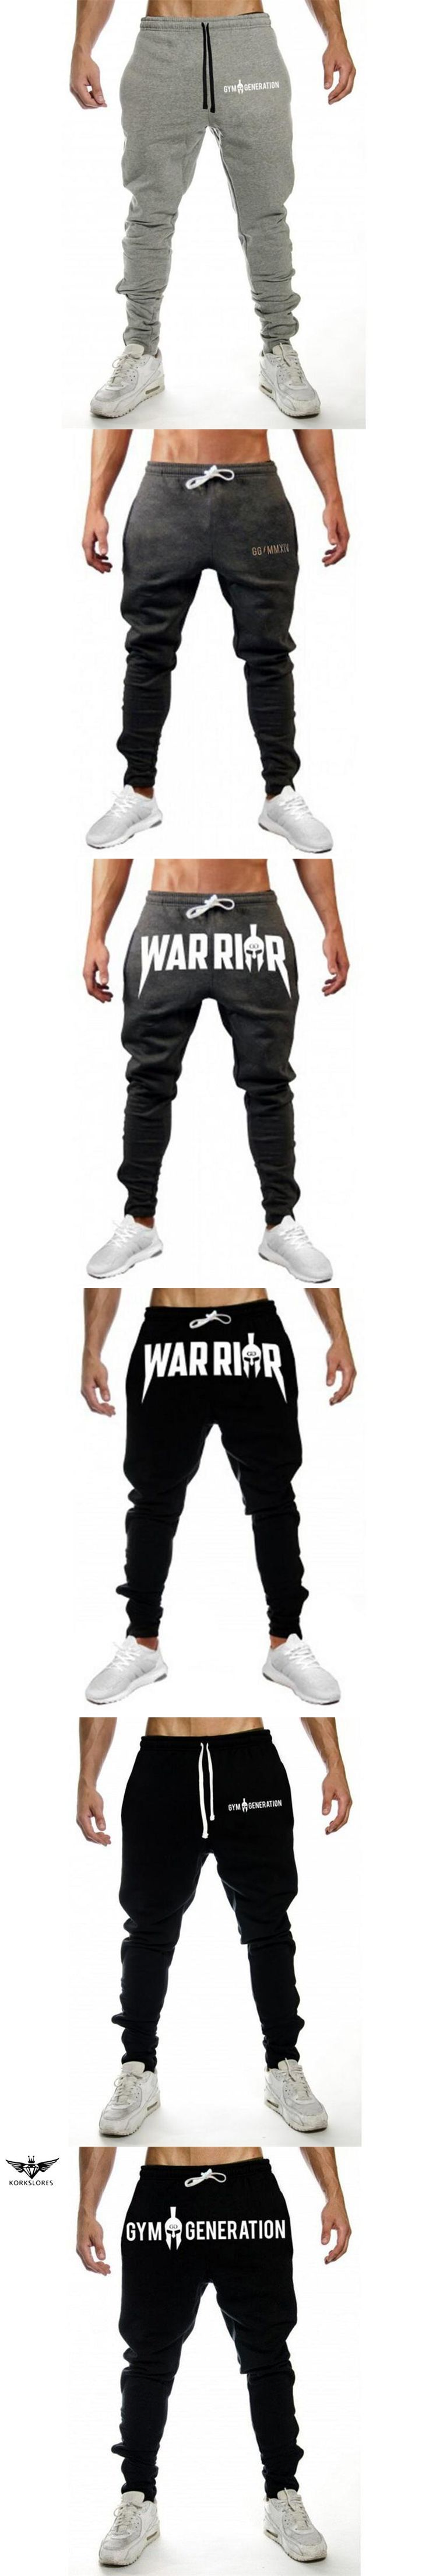 KORKSLORES Autumn New Mens Fitness Sweatpants Pant Male Bodybuilding Workout Casual Elastic Cotton Brand Trousers Joggers Pants